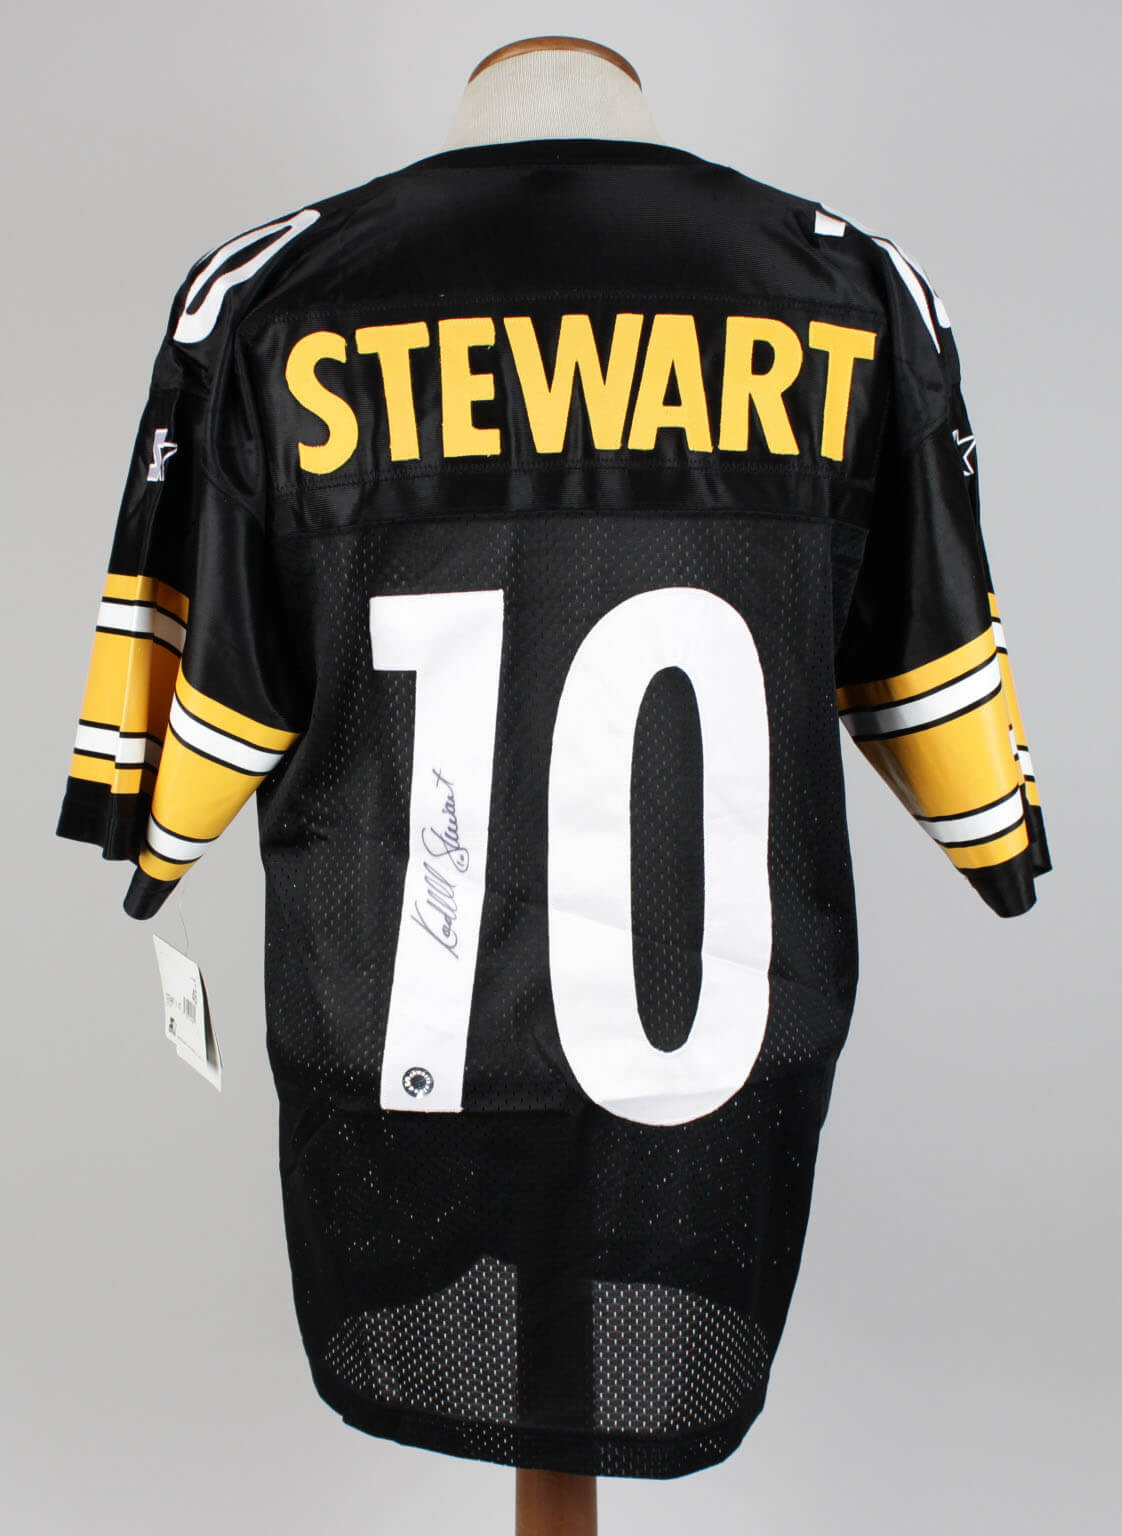 c788e4f49 Kordell Stewart Pittsburgh Steelers Signed Inscribed (10) Black Jersey  Signature grades 9-10 - Memorabilia Expert